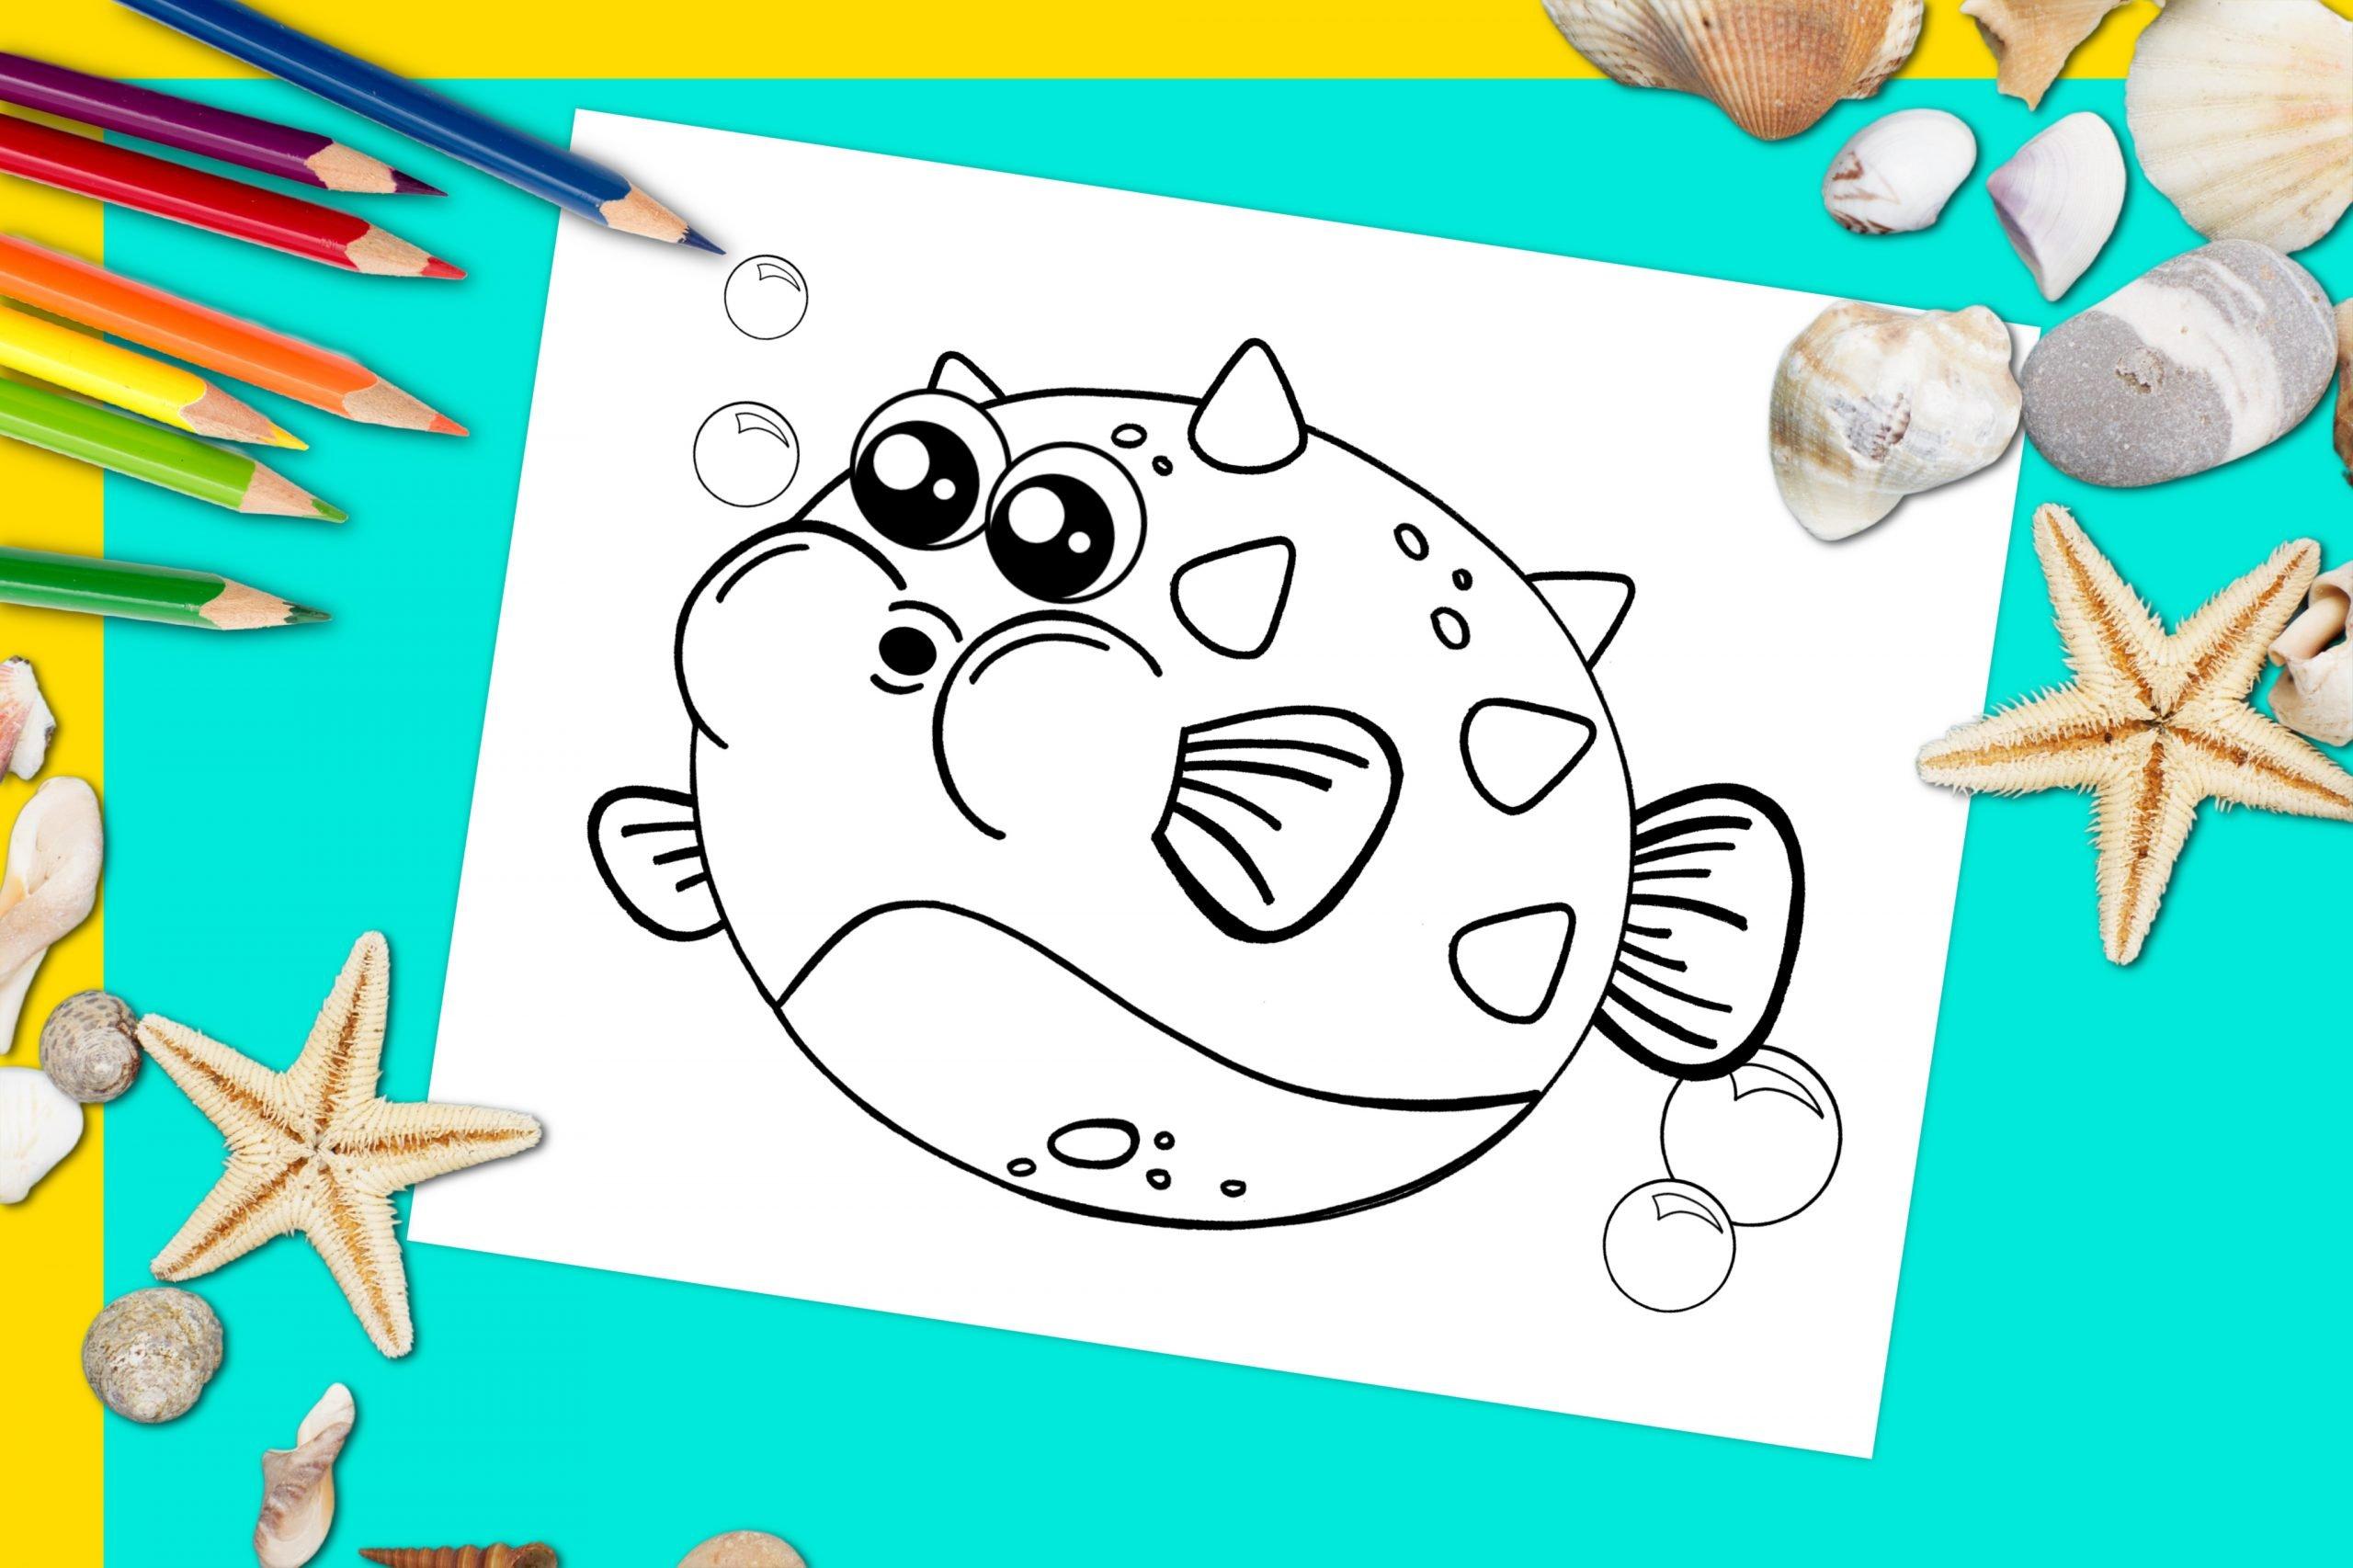 Free Printable Blowfish Pufferfish Ocean Animal Coloring Page for kids